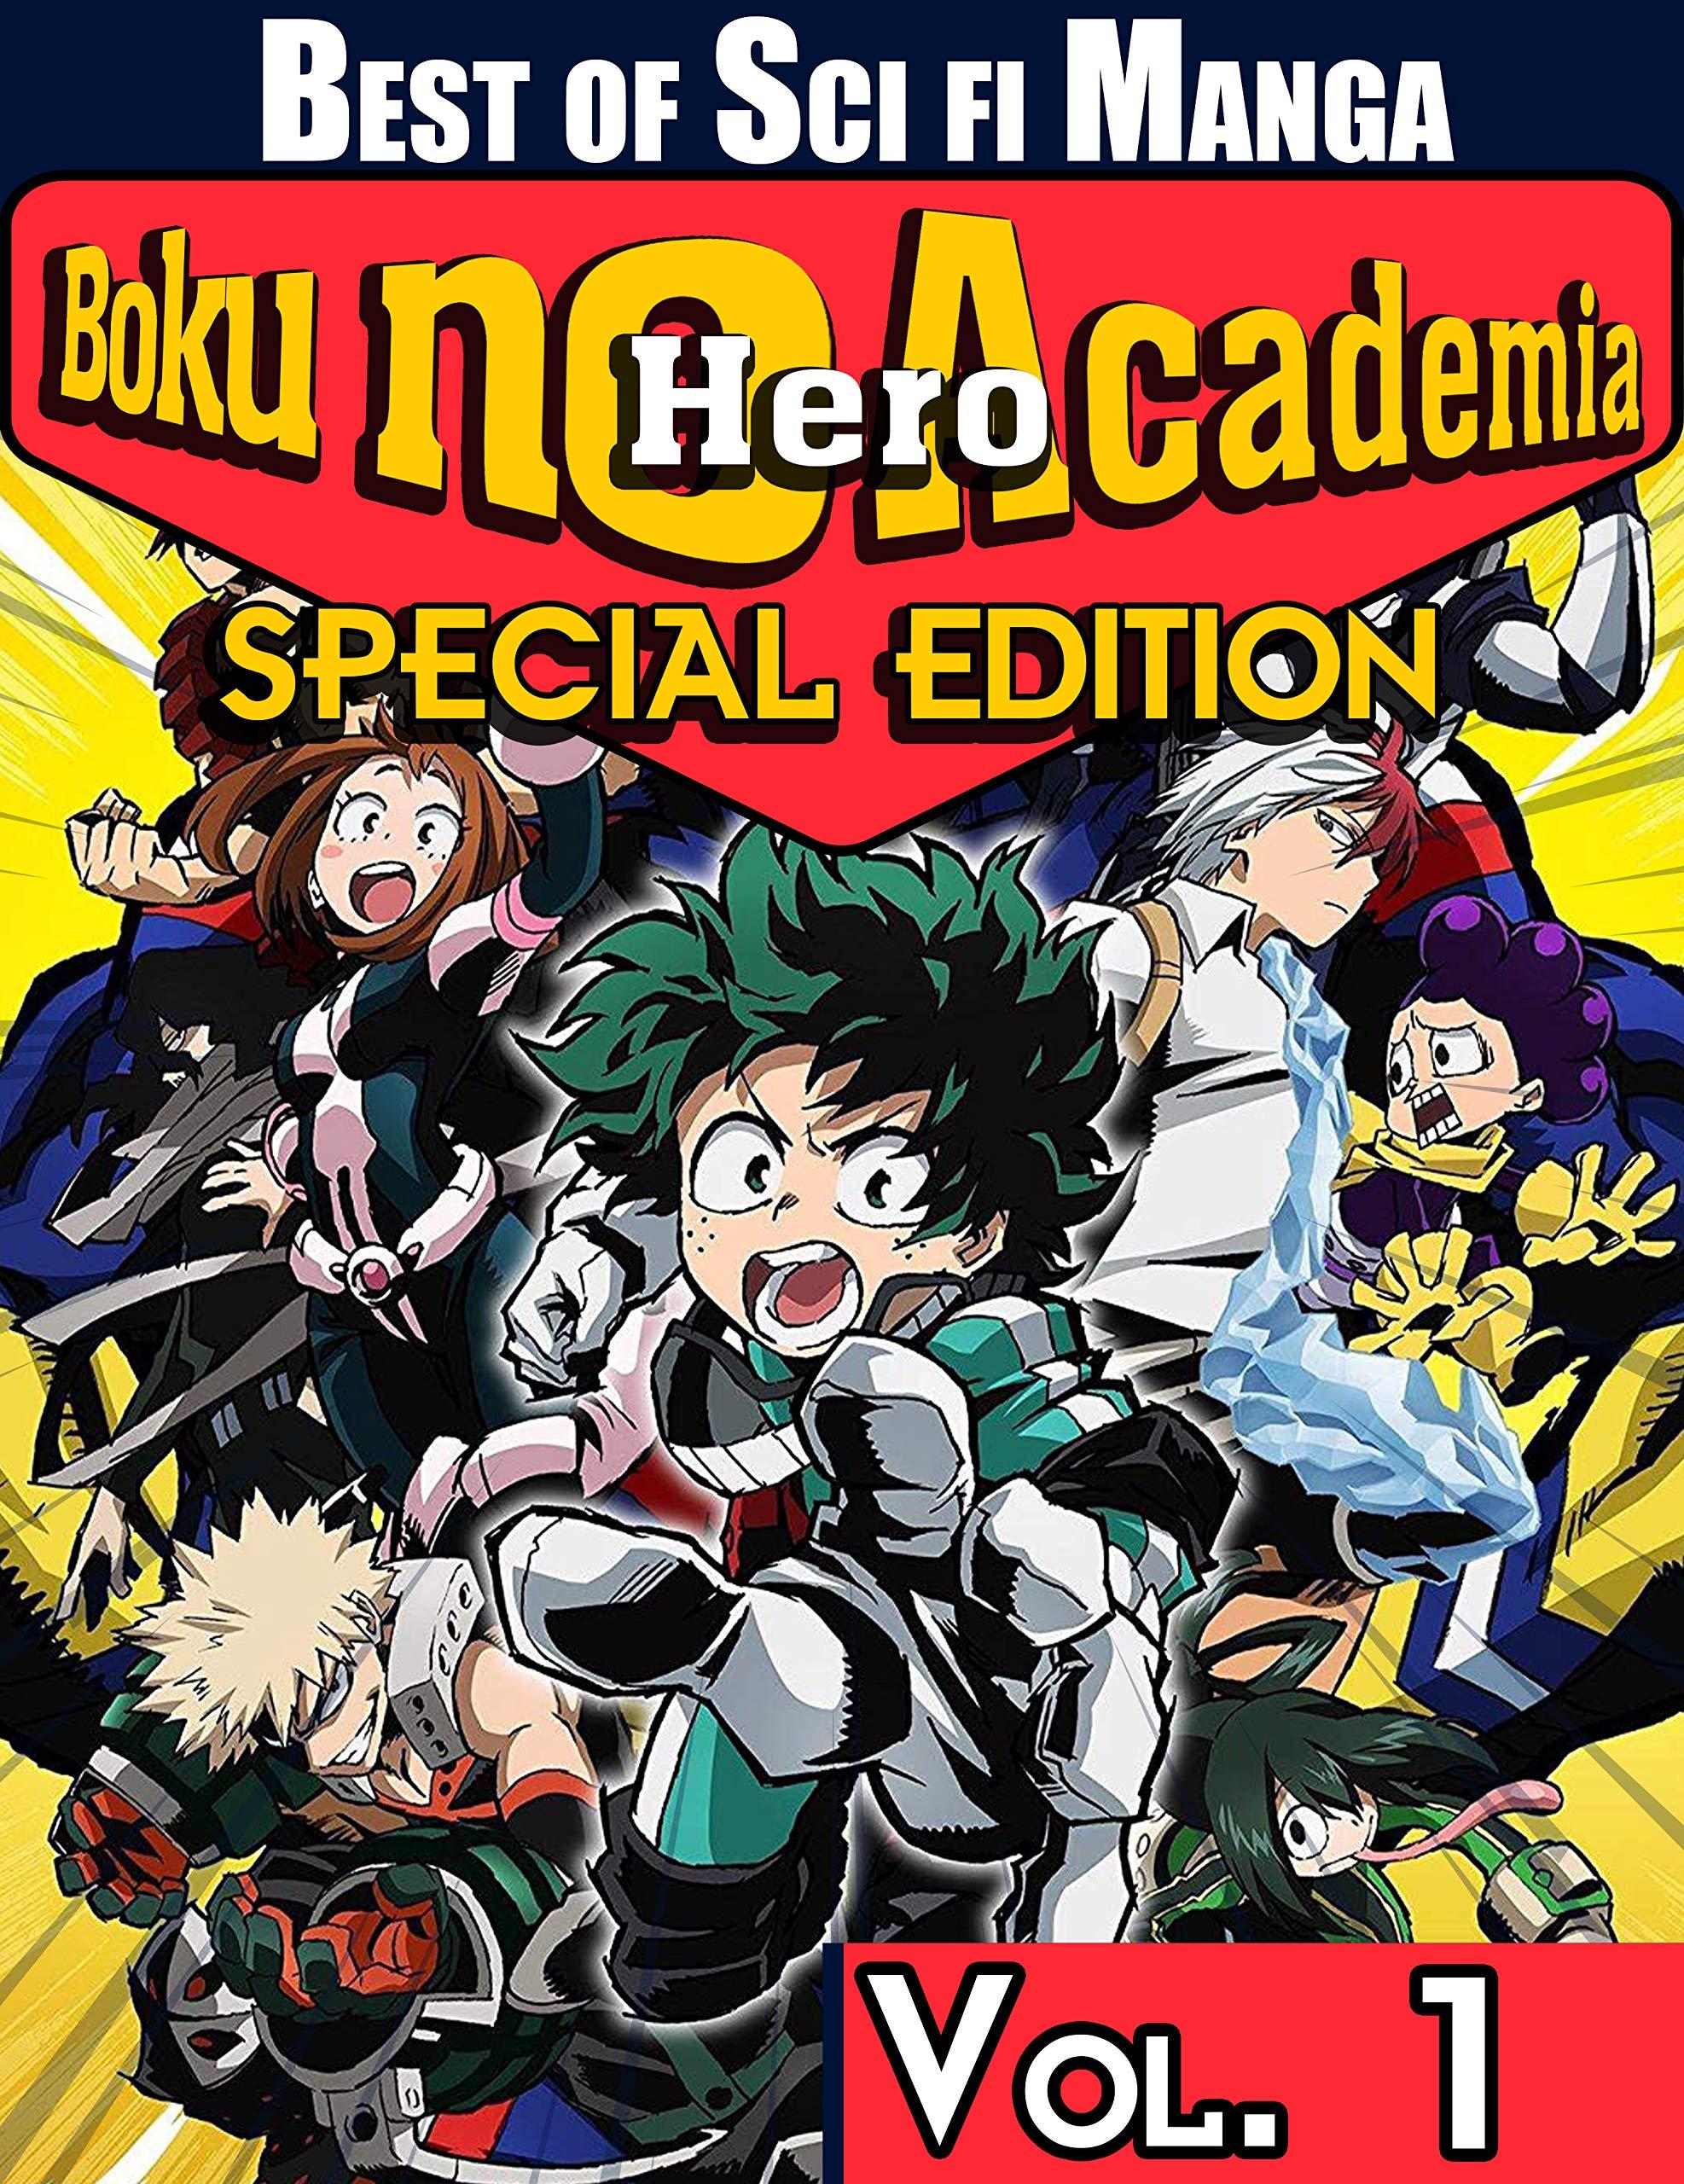 Best of Sci fi Manga Boku no Hero Academia Special Edition: Limited Edition Boku no Hero Academia Vol 1